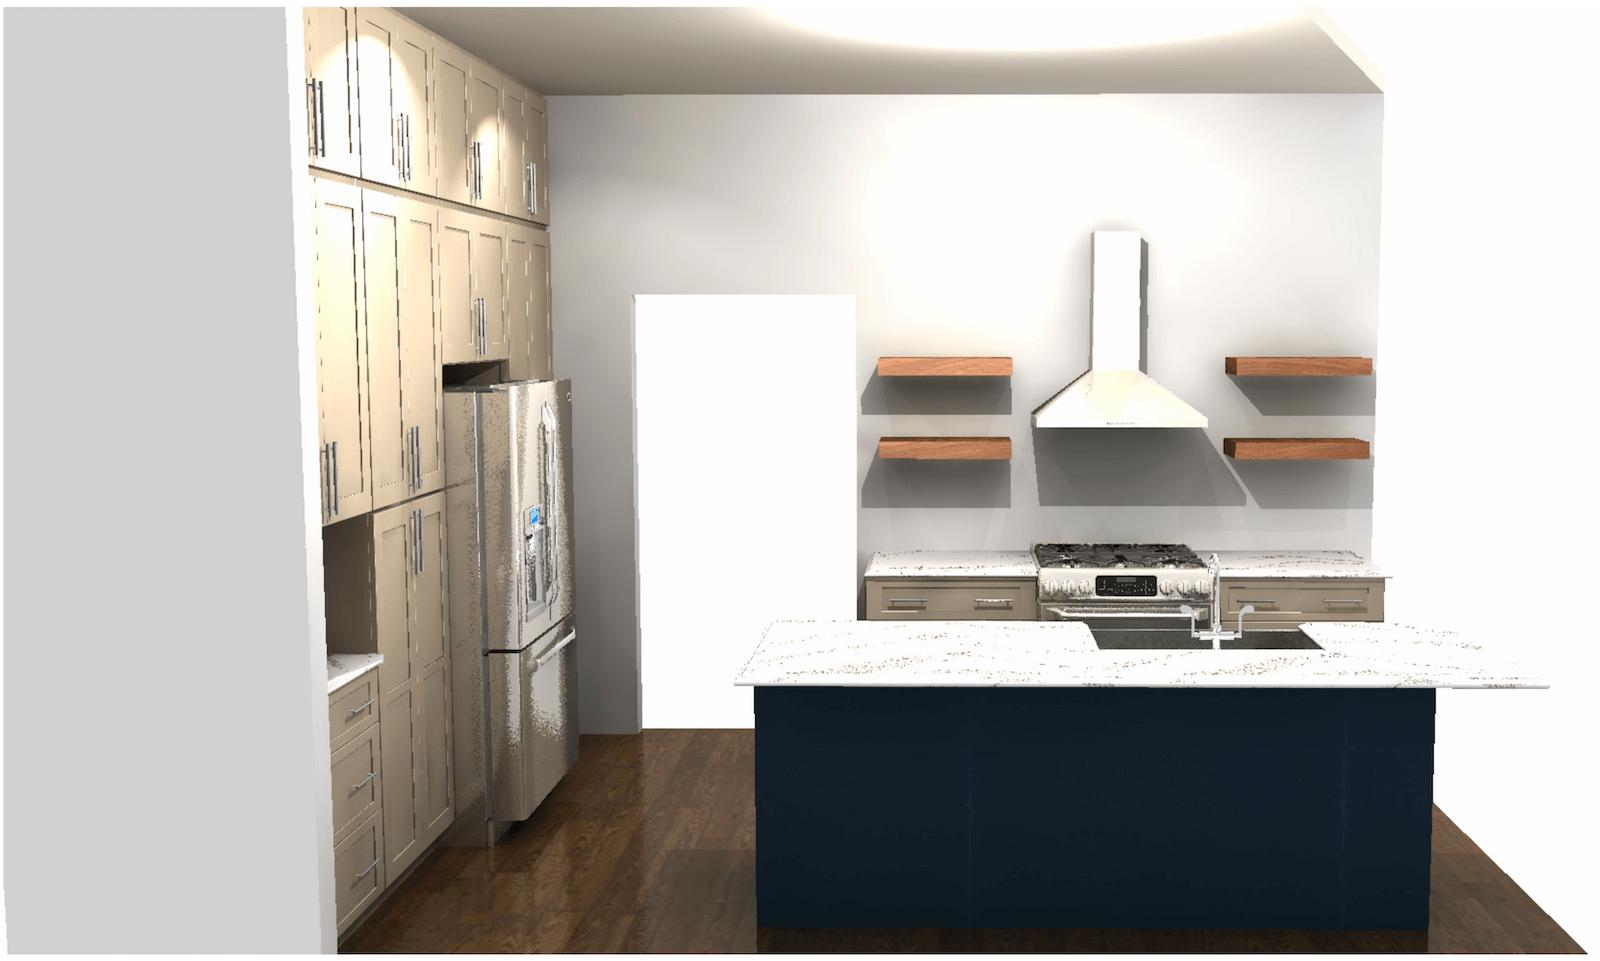 Kitchen Rendering of Island View